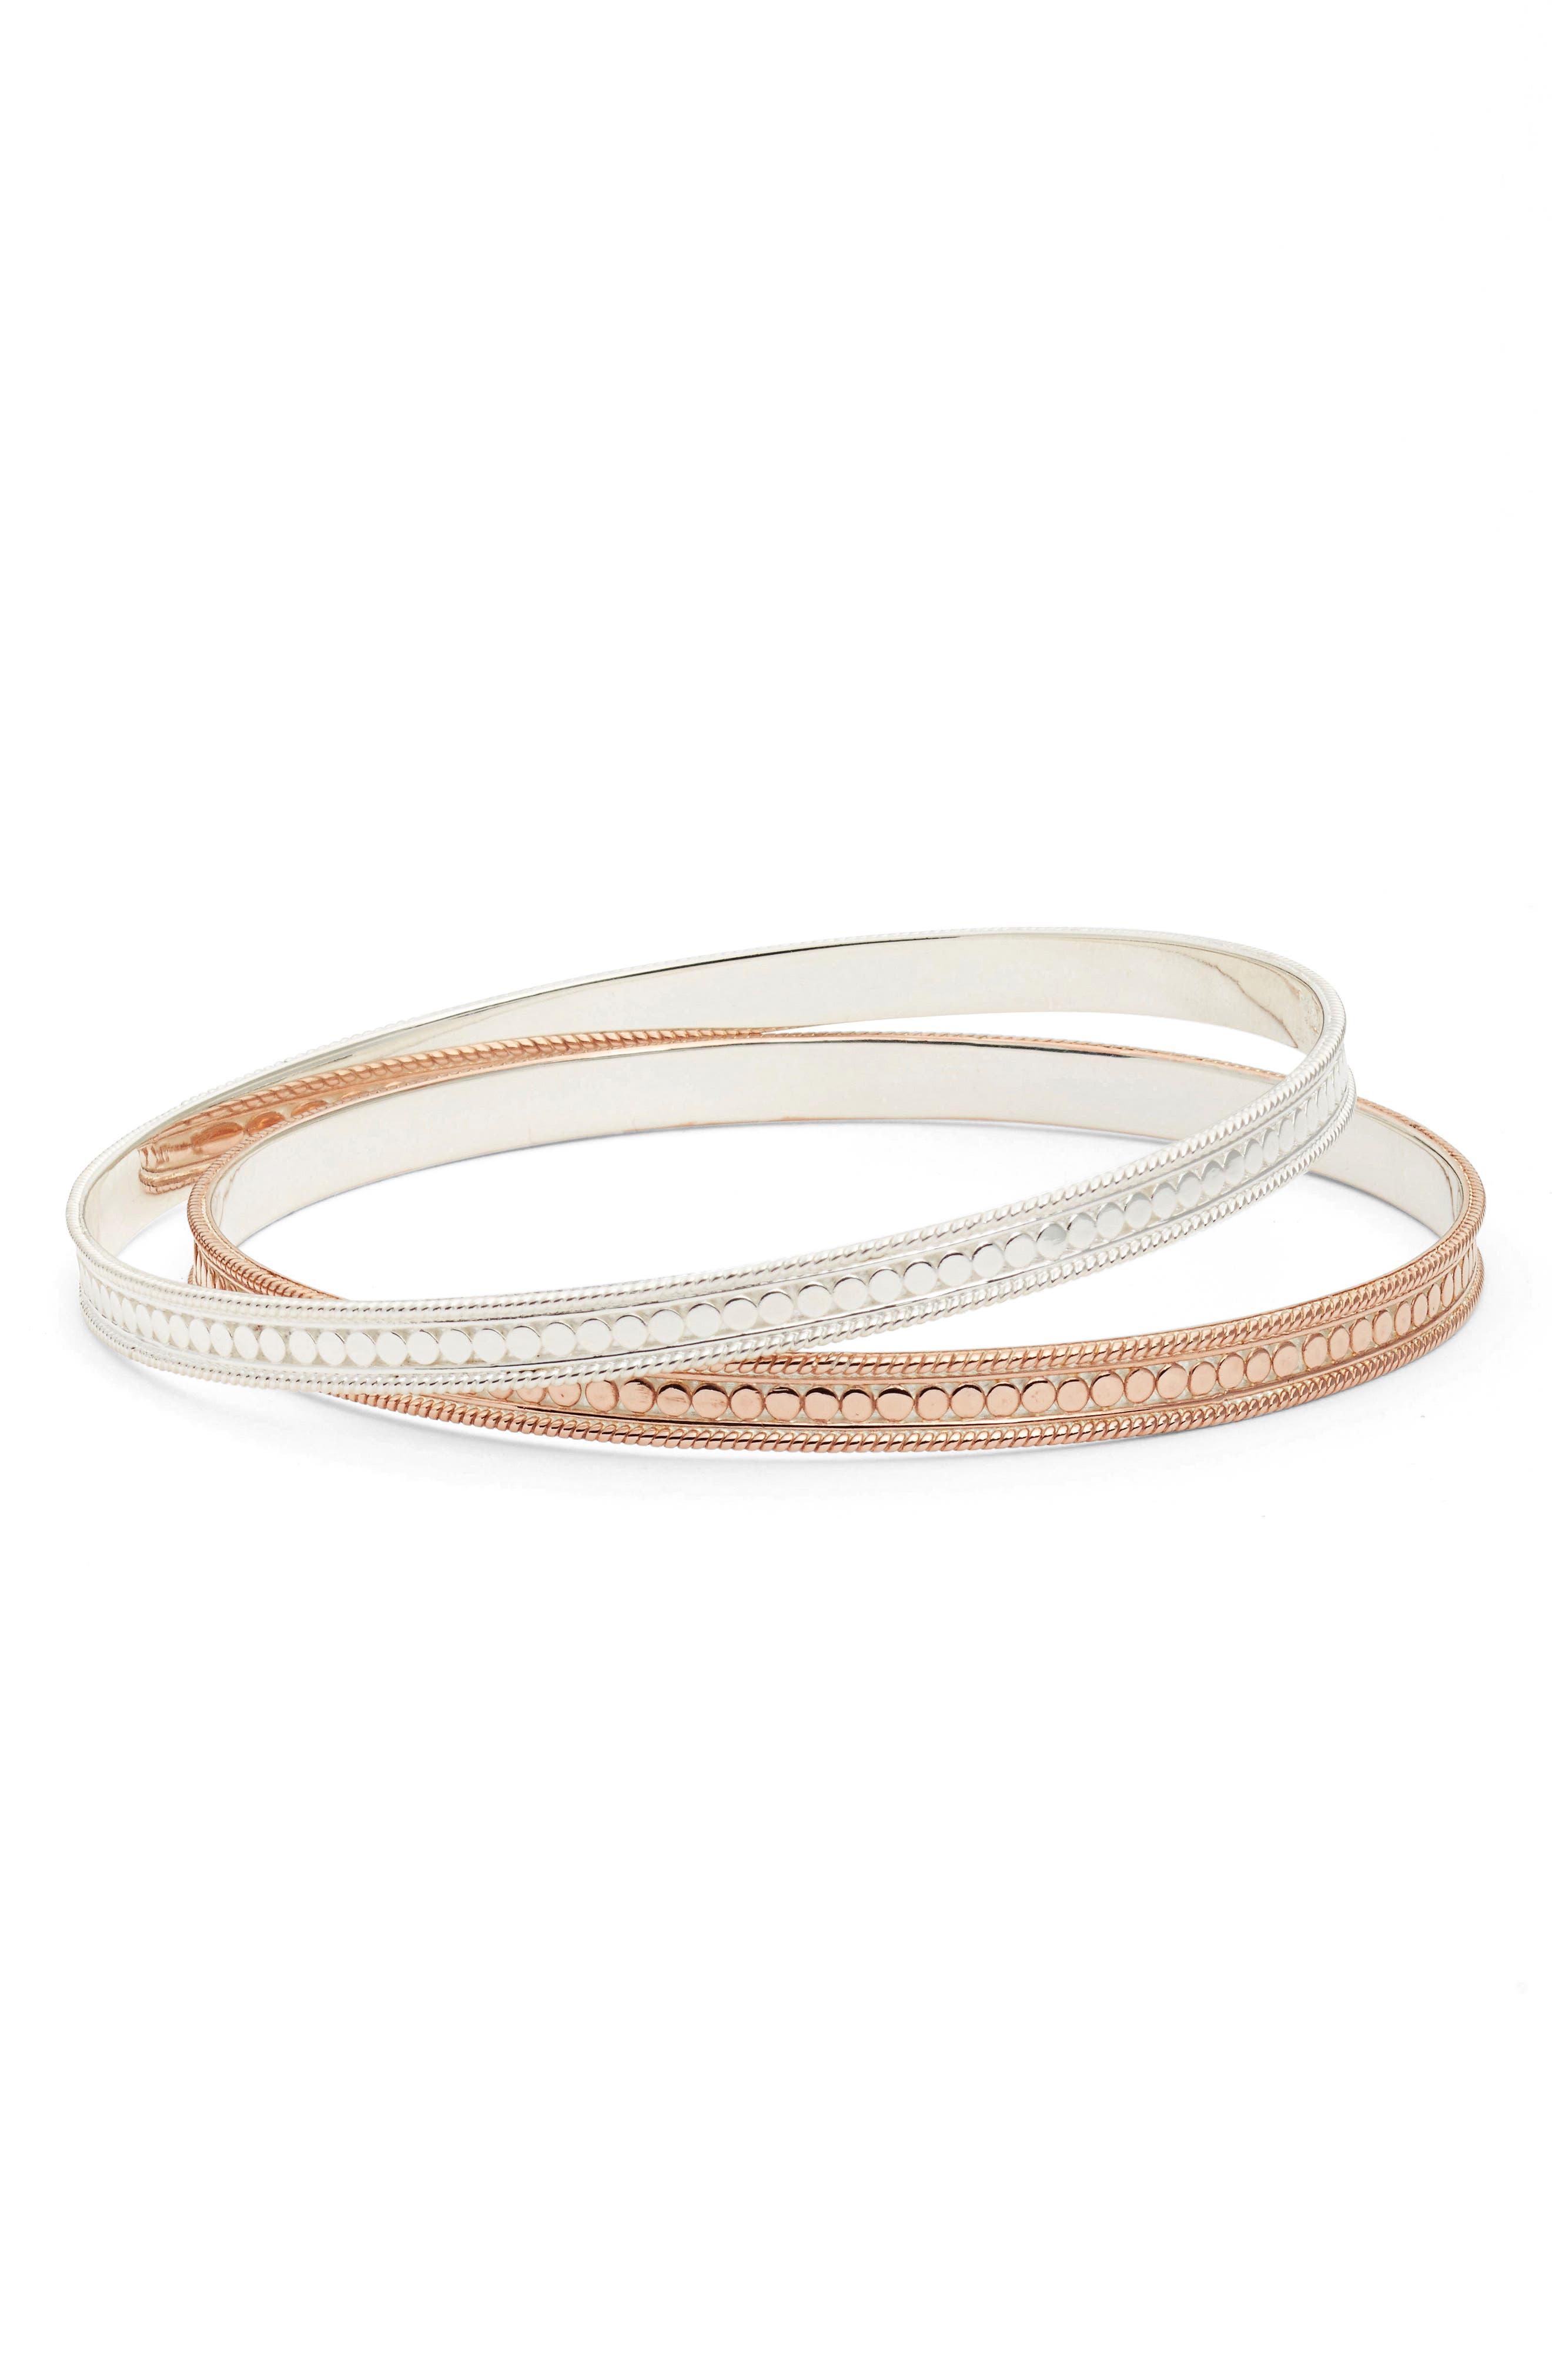 Main Image - Anna Beck Set of 2 Bangle Bracelets